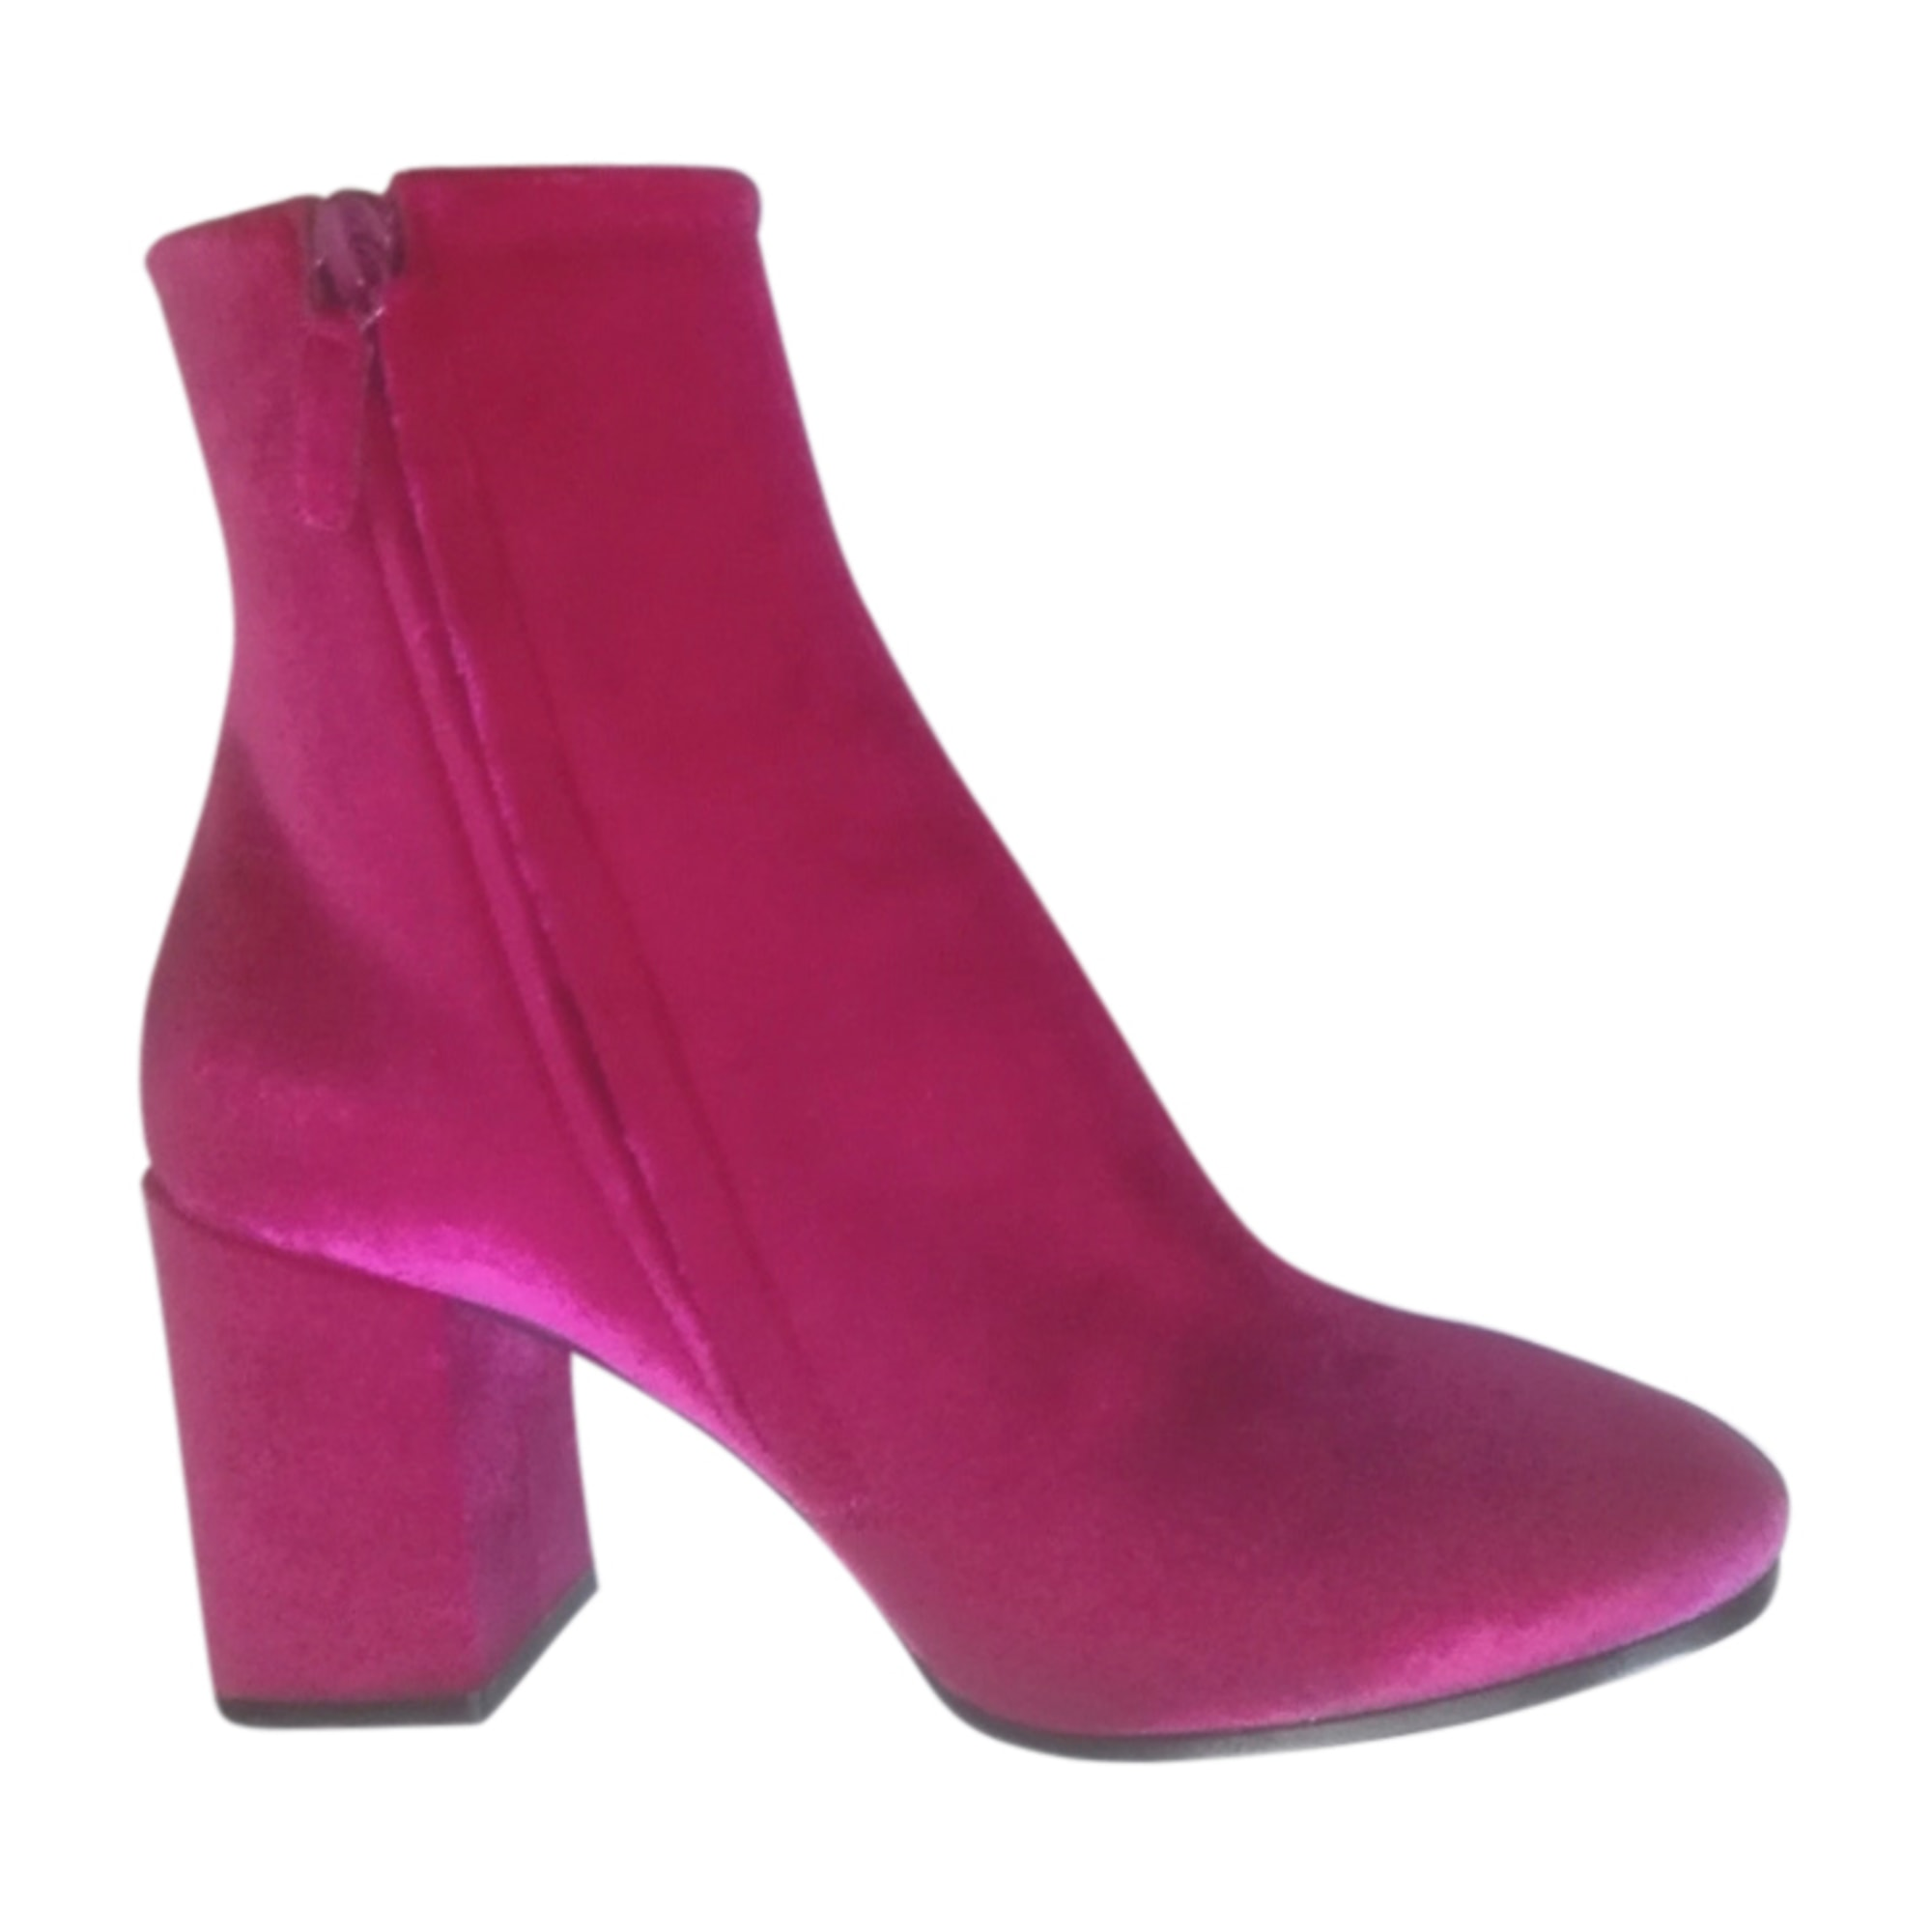 Bottines & low boots à talons BALENCIAGA Rose, fuschia, vieux rose